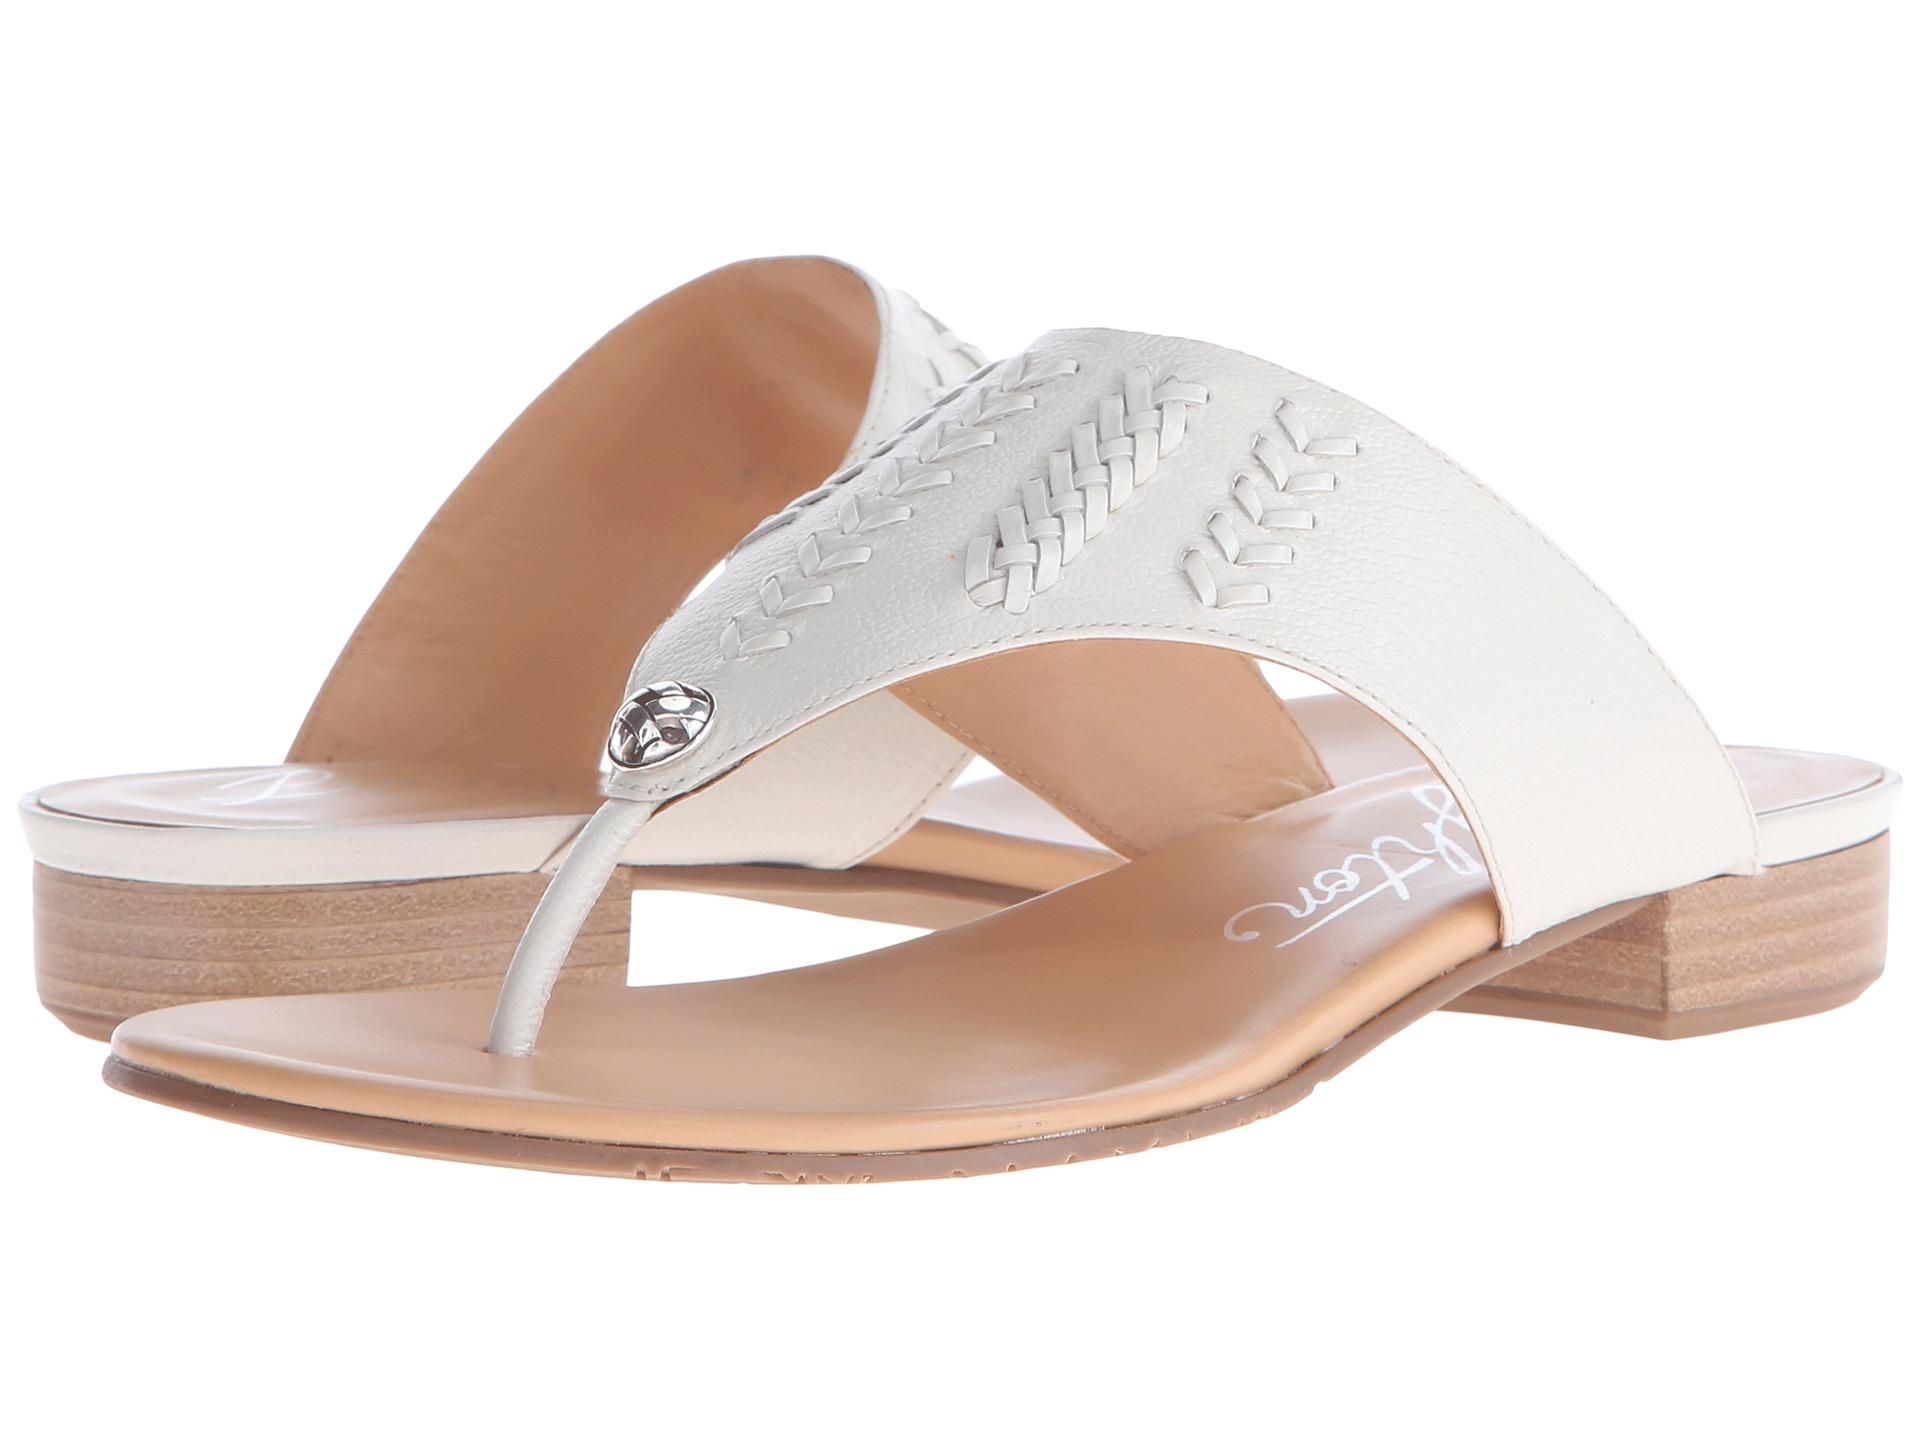 Brighton Shoes Flats